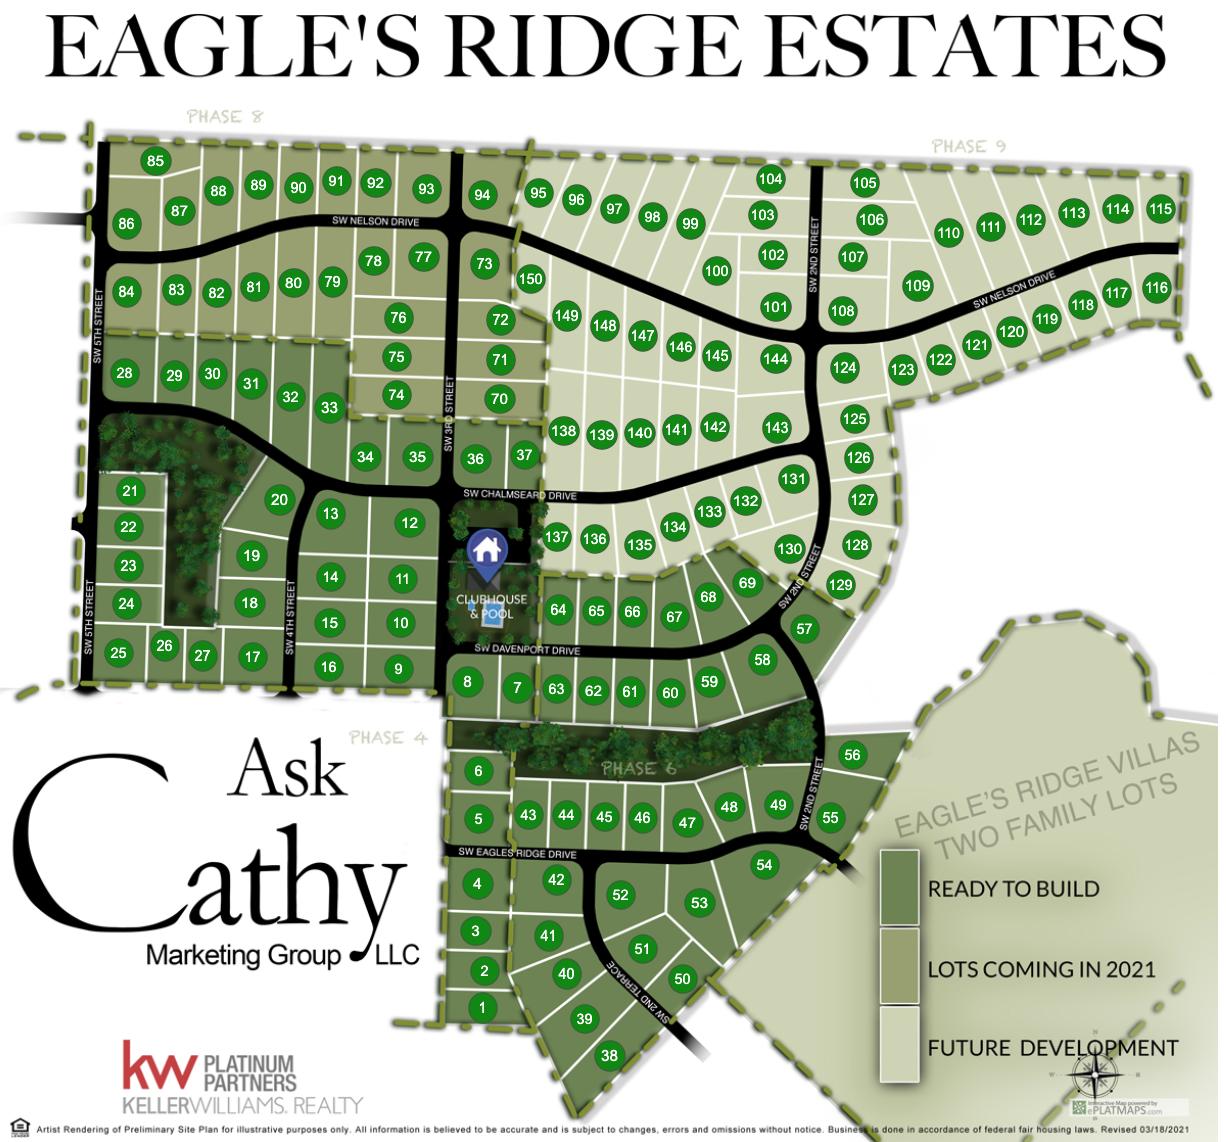 Artist Rendering Portfolio Eagles Ridge Cathy